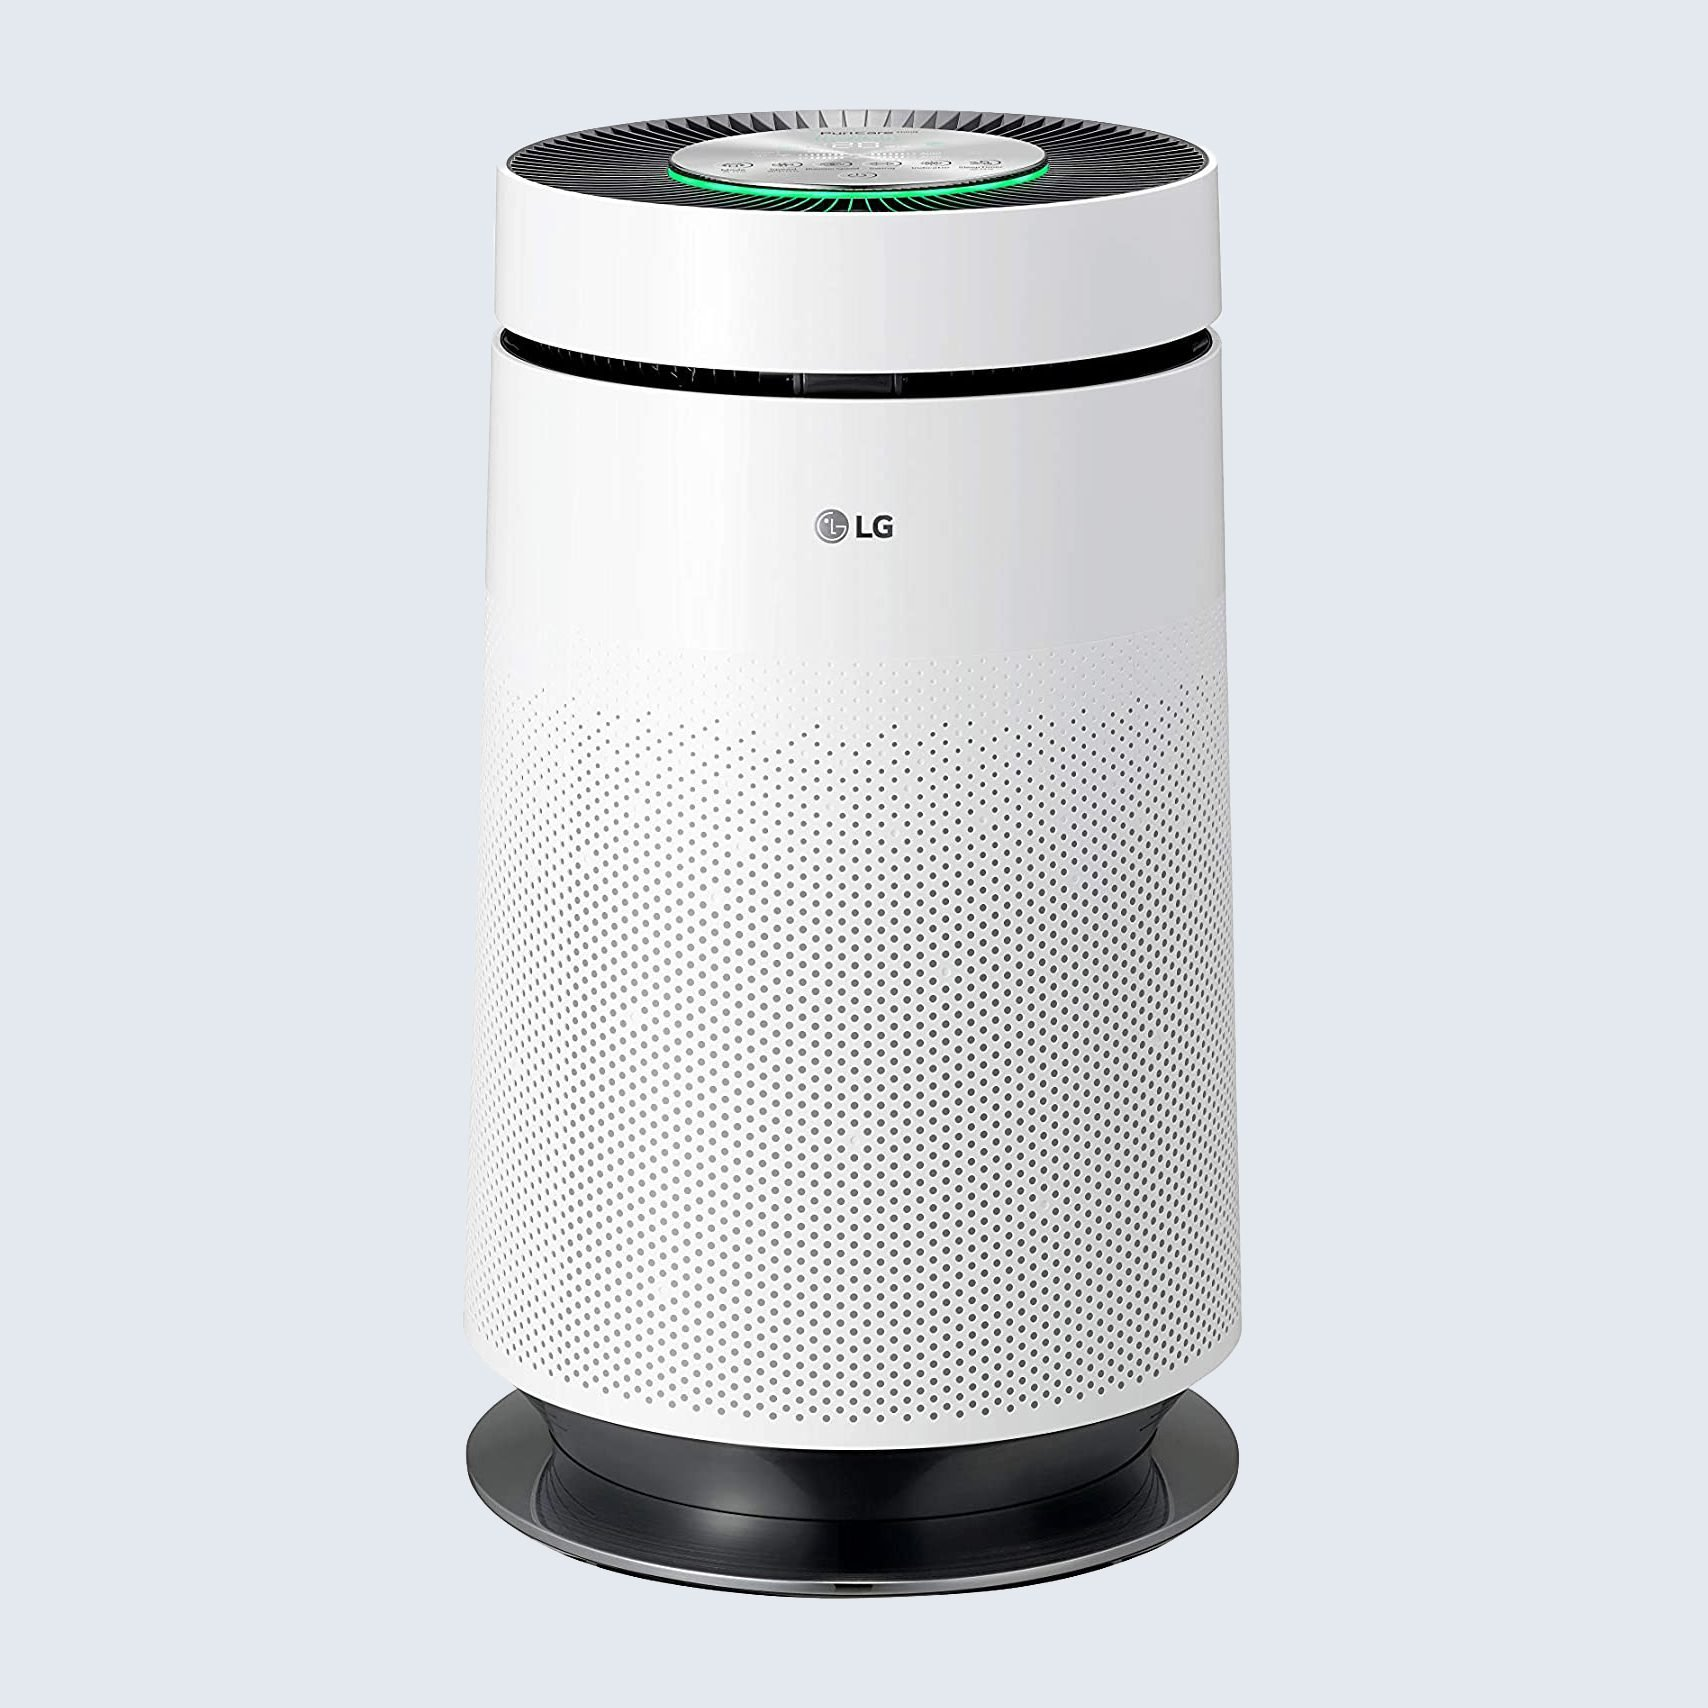 LG PuriCare 360-Degree Air Purifier